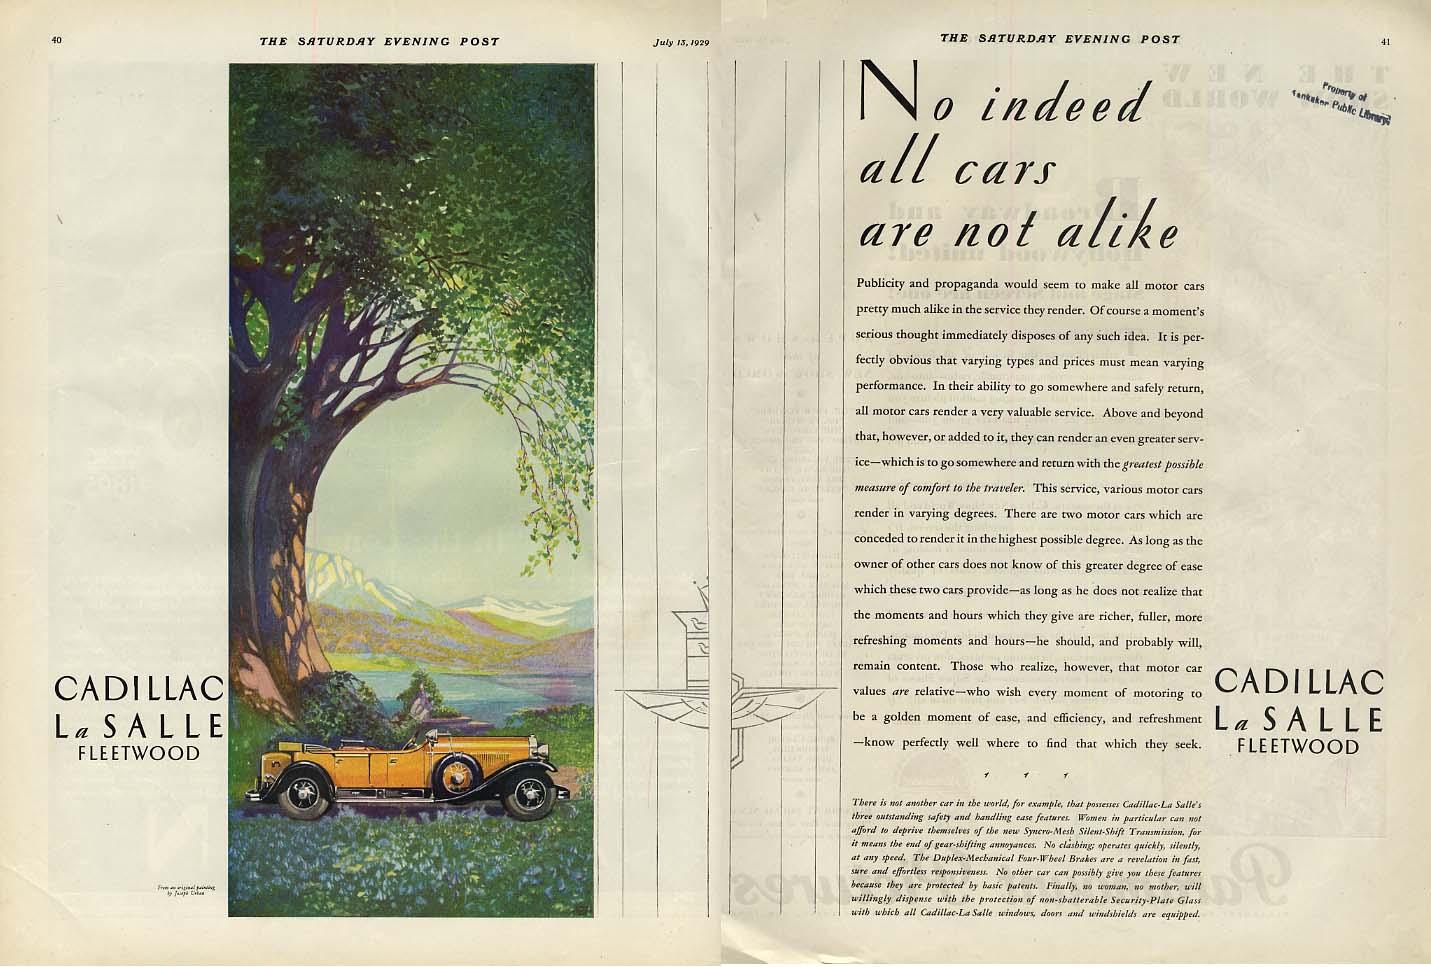 All cars are not alike Cadillac / In the long run Auburn 120 ad 1929